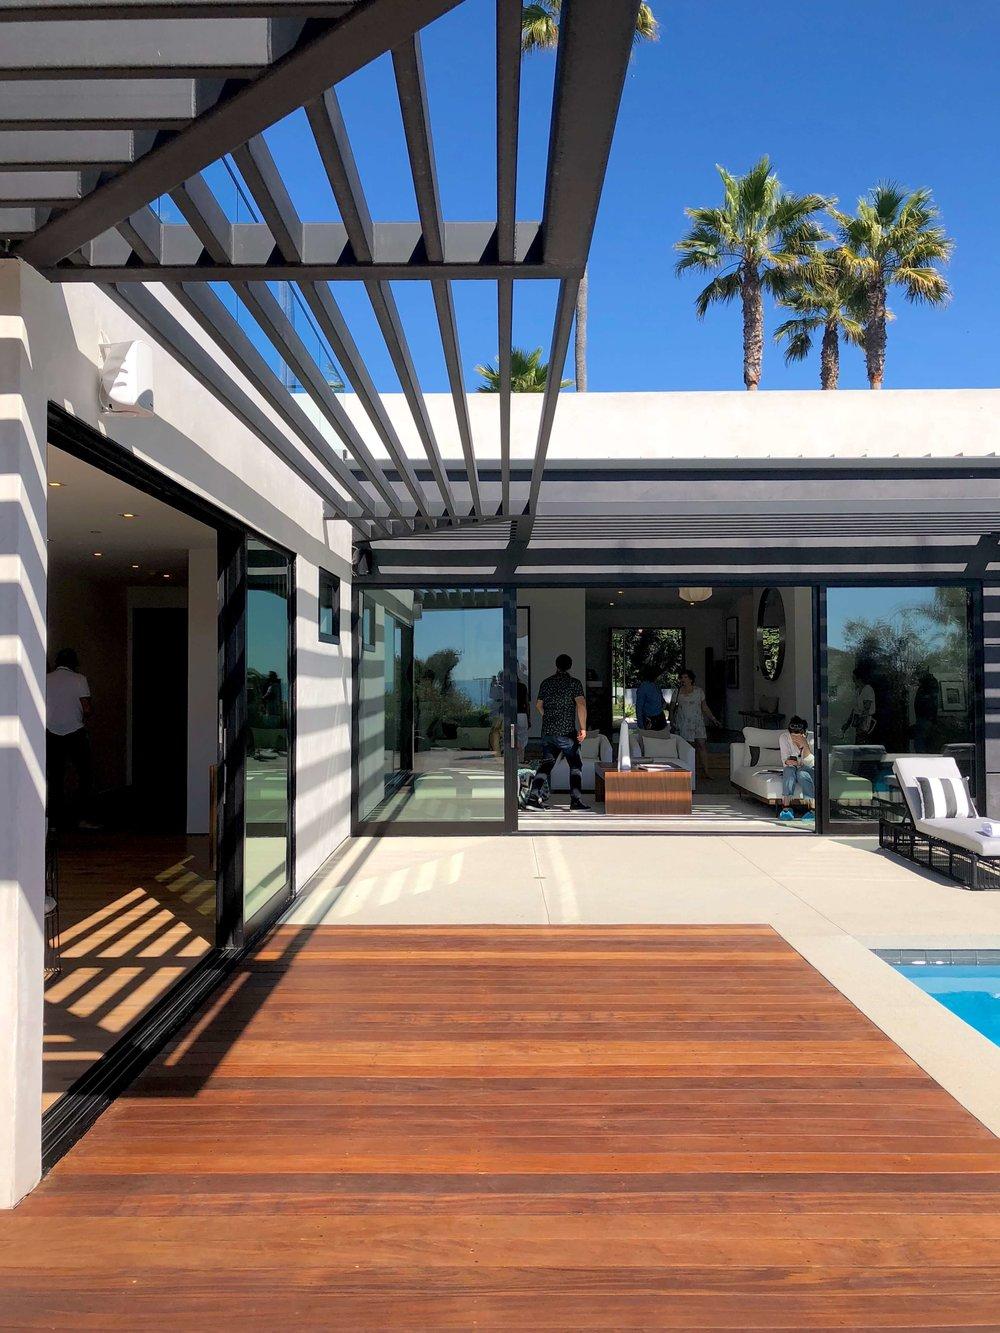 California contemporary home, Dwell on Design's Fall Home Tour, Designer: Vitus Matare #pergola #slidingdoors #patio